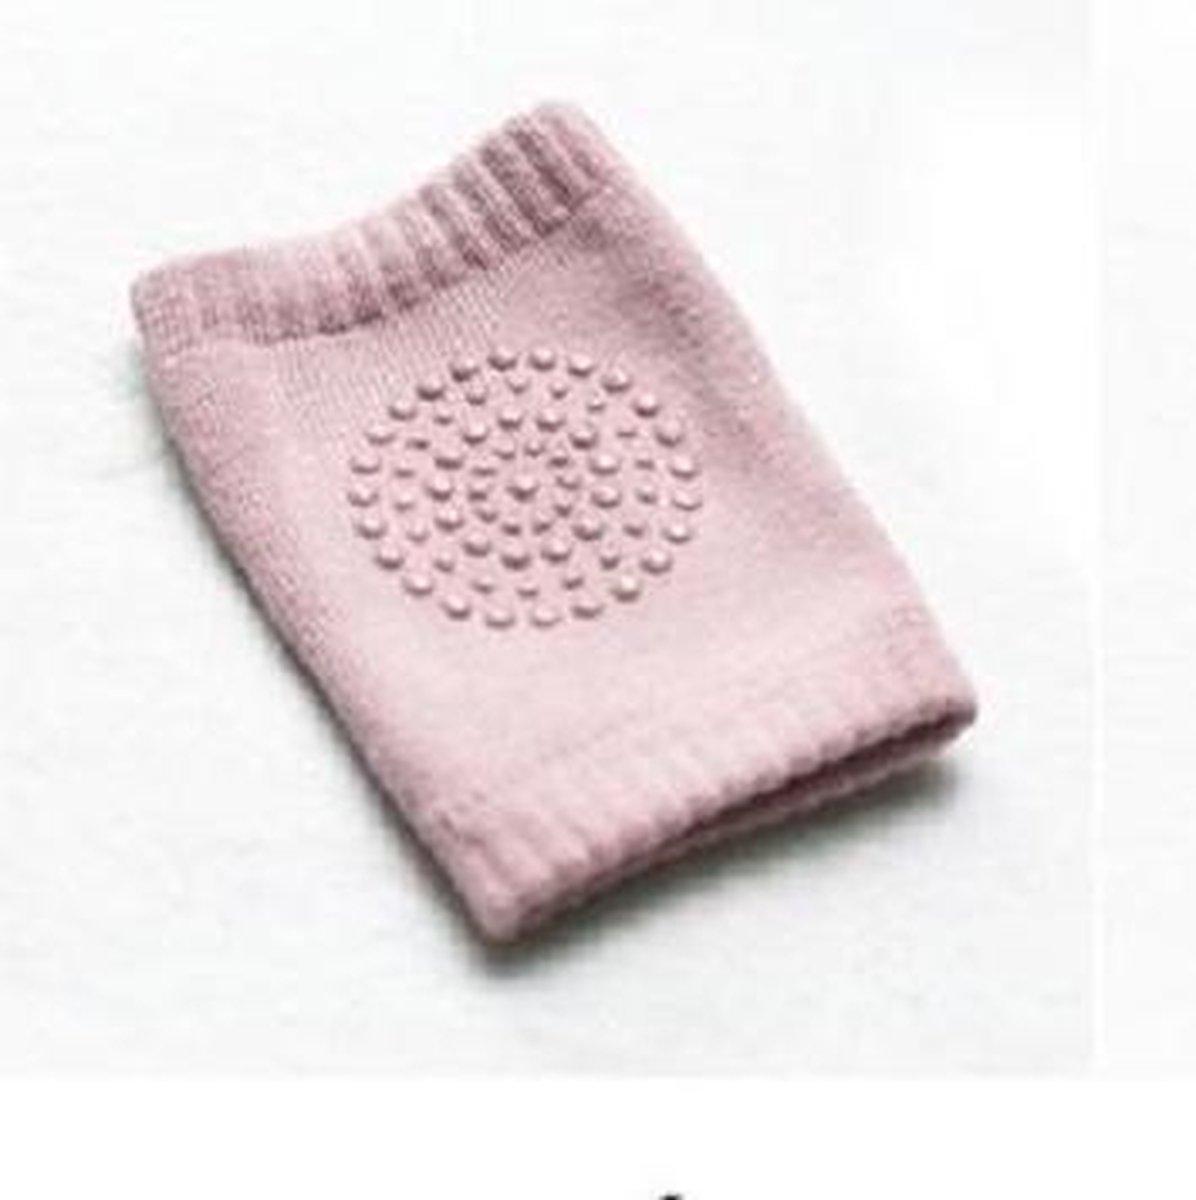 Baby kniebeschermers - 1 Paar - Roze